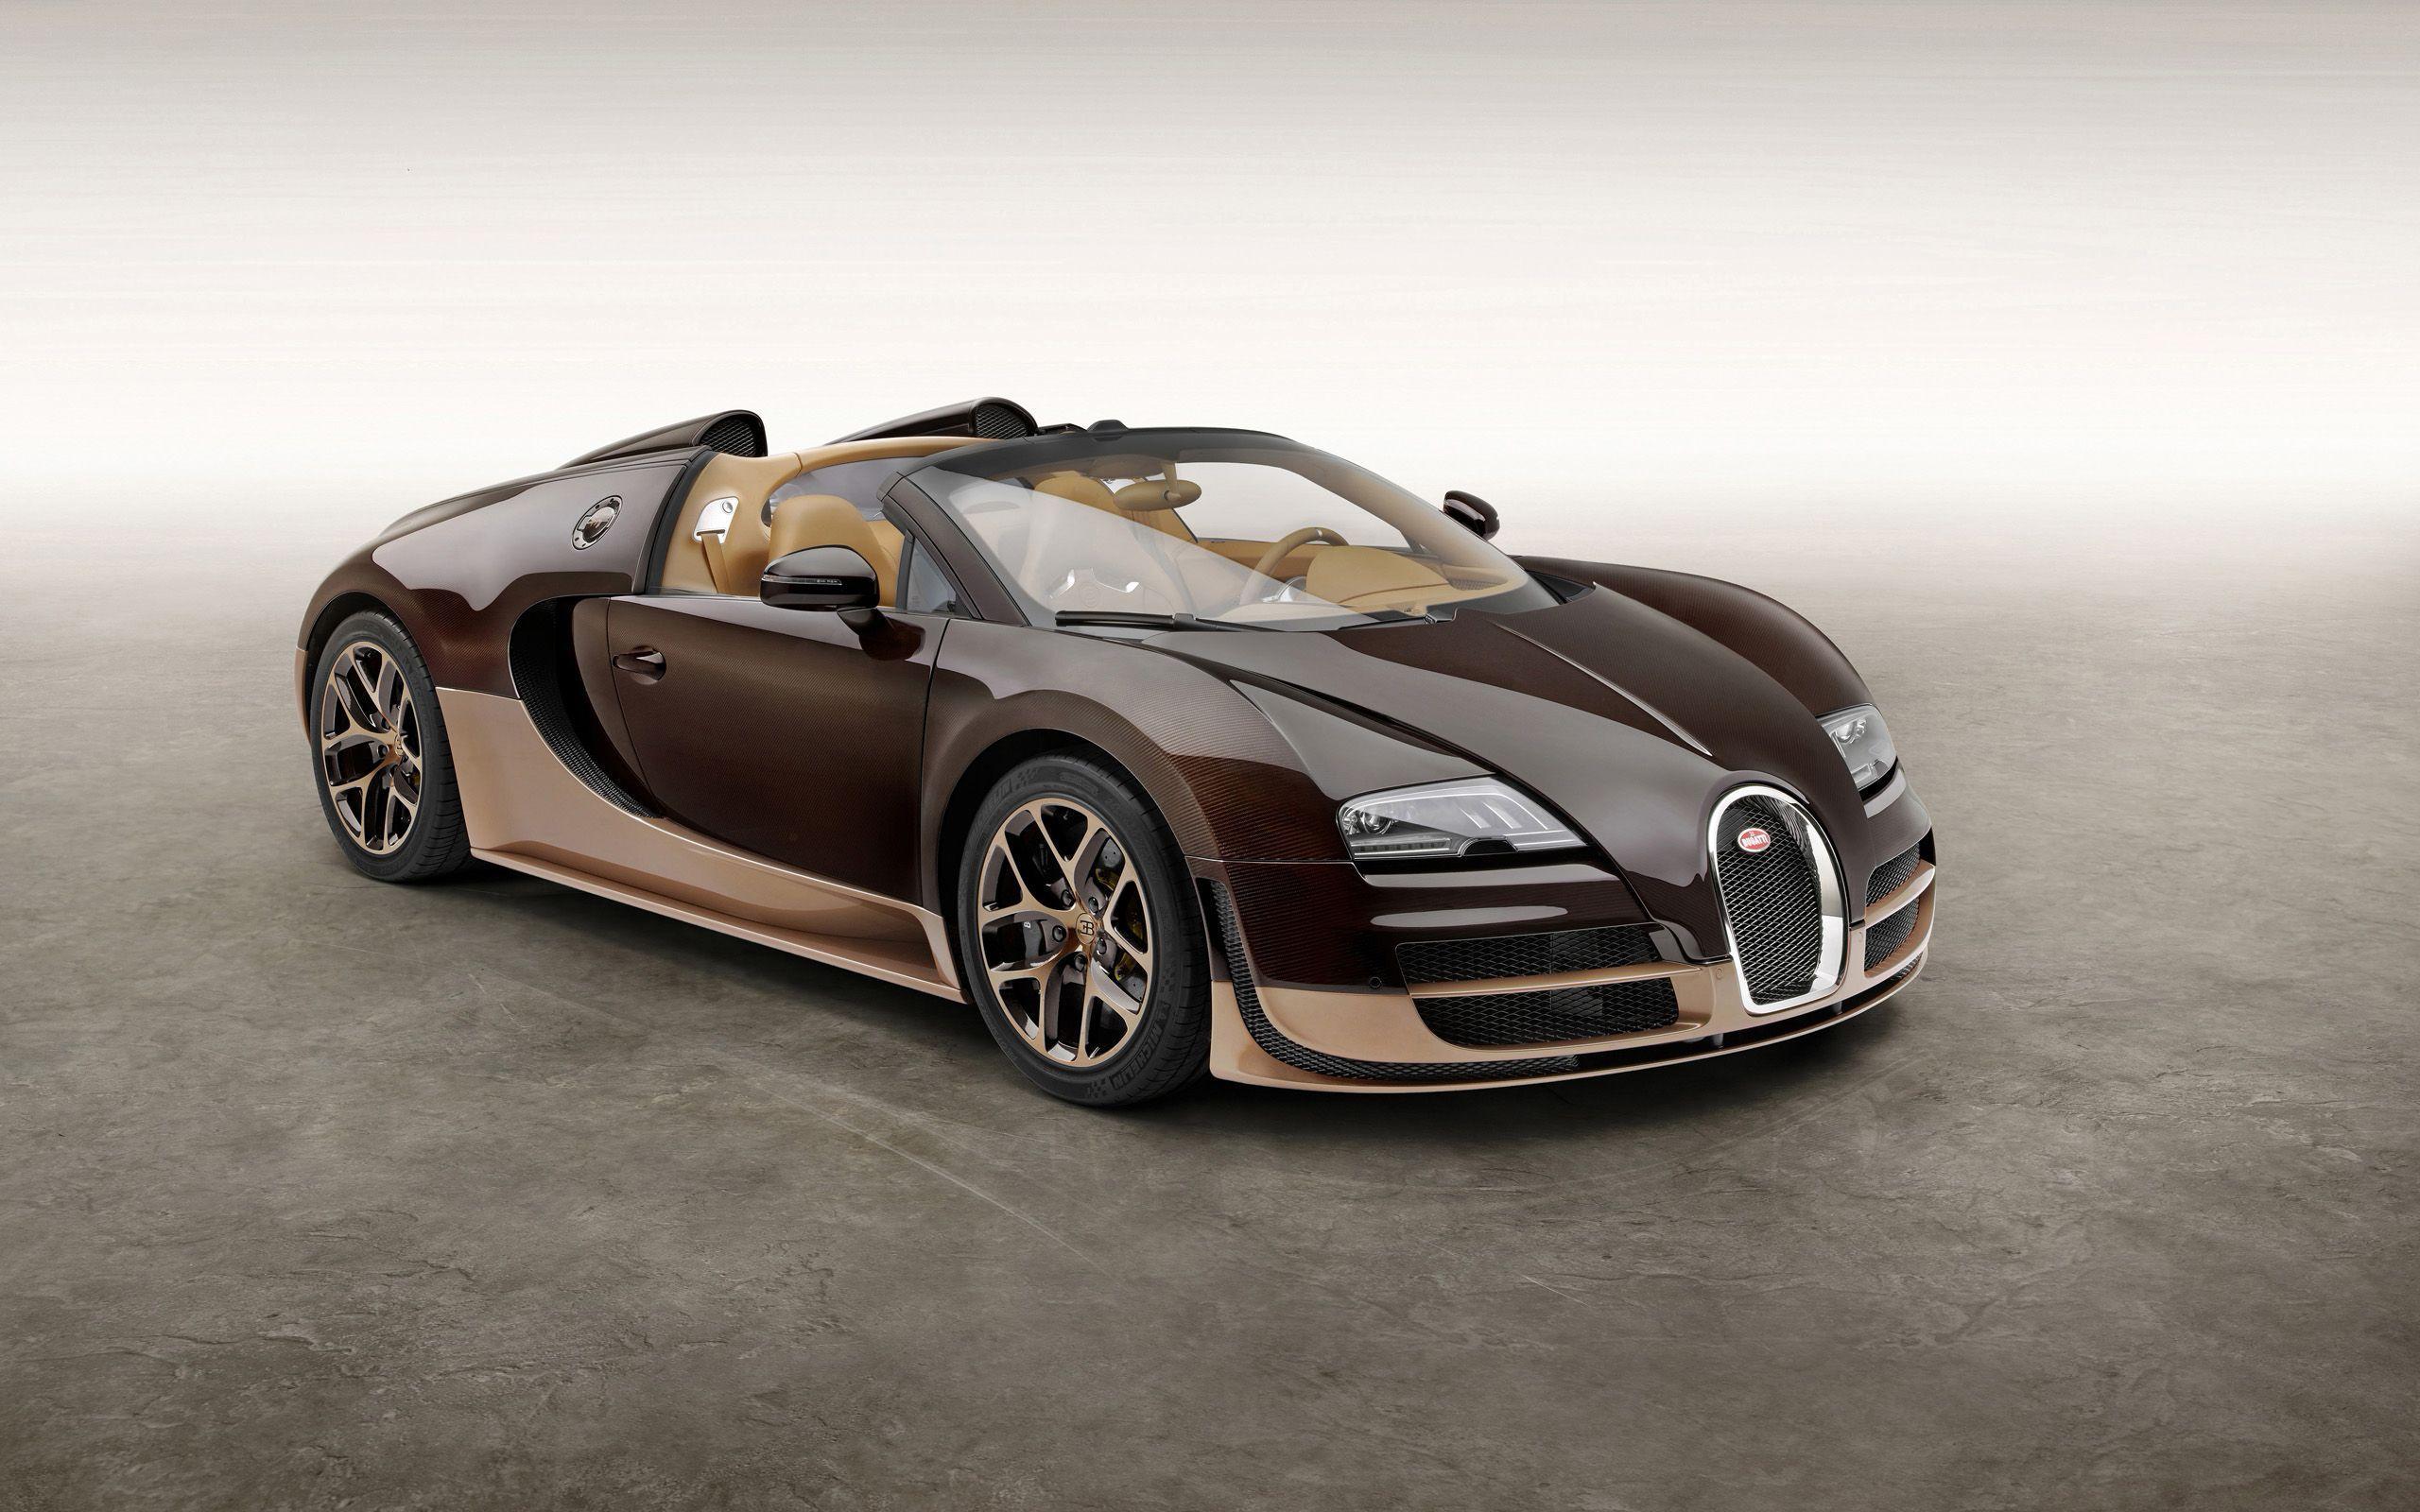 Bugatti Veyron Grand Sport Wallpapers Top Free Bugatti Veyron